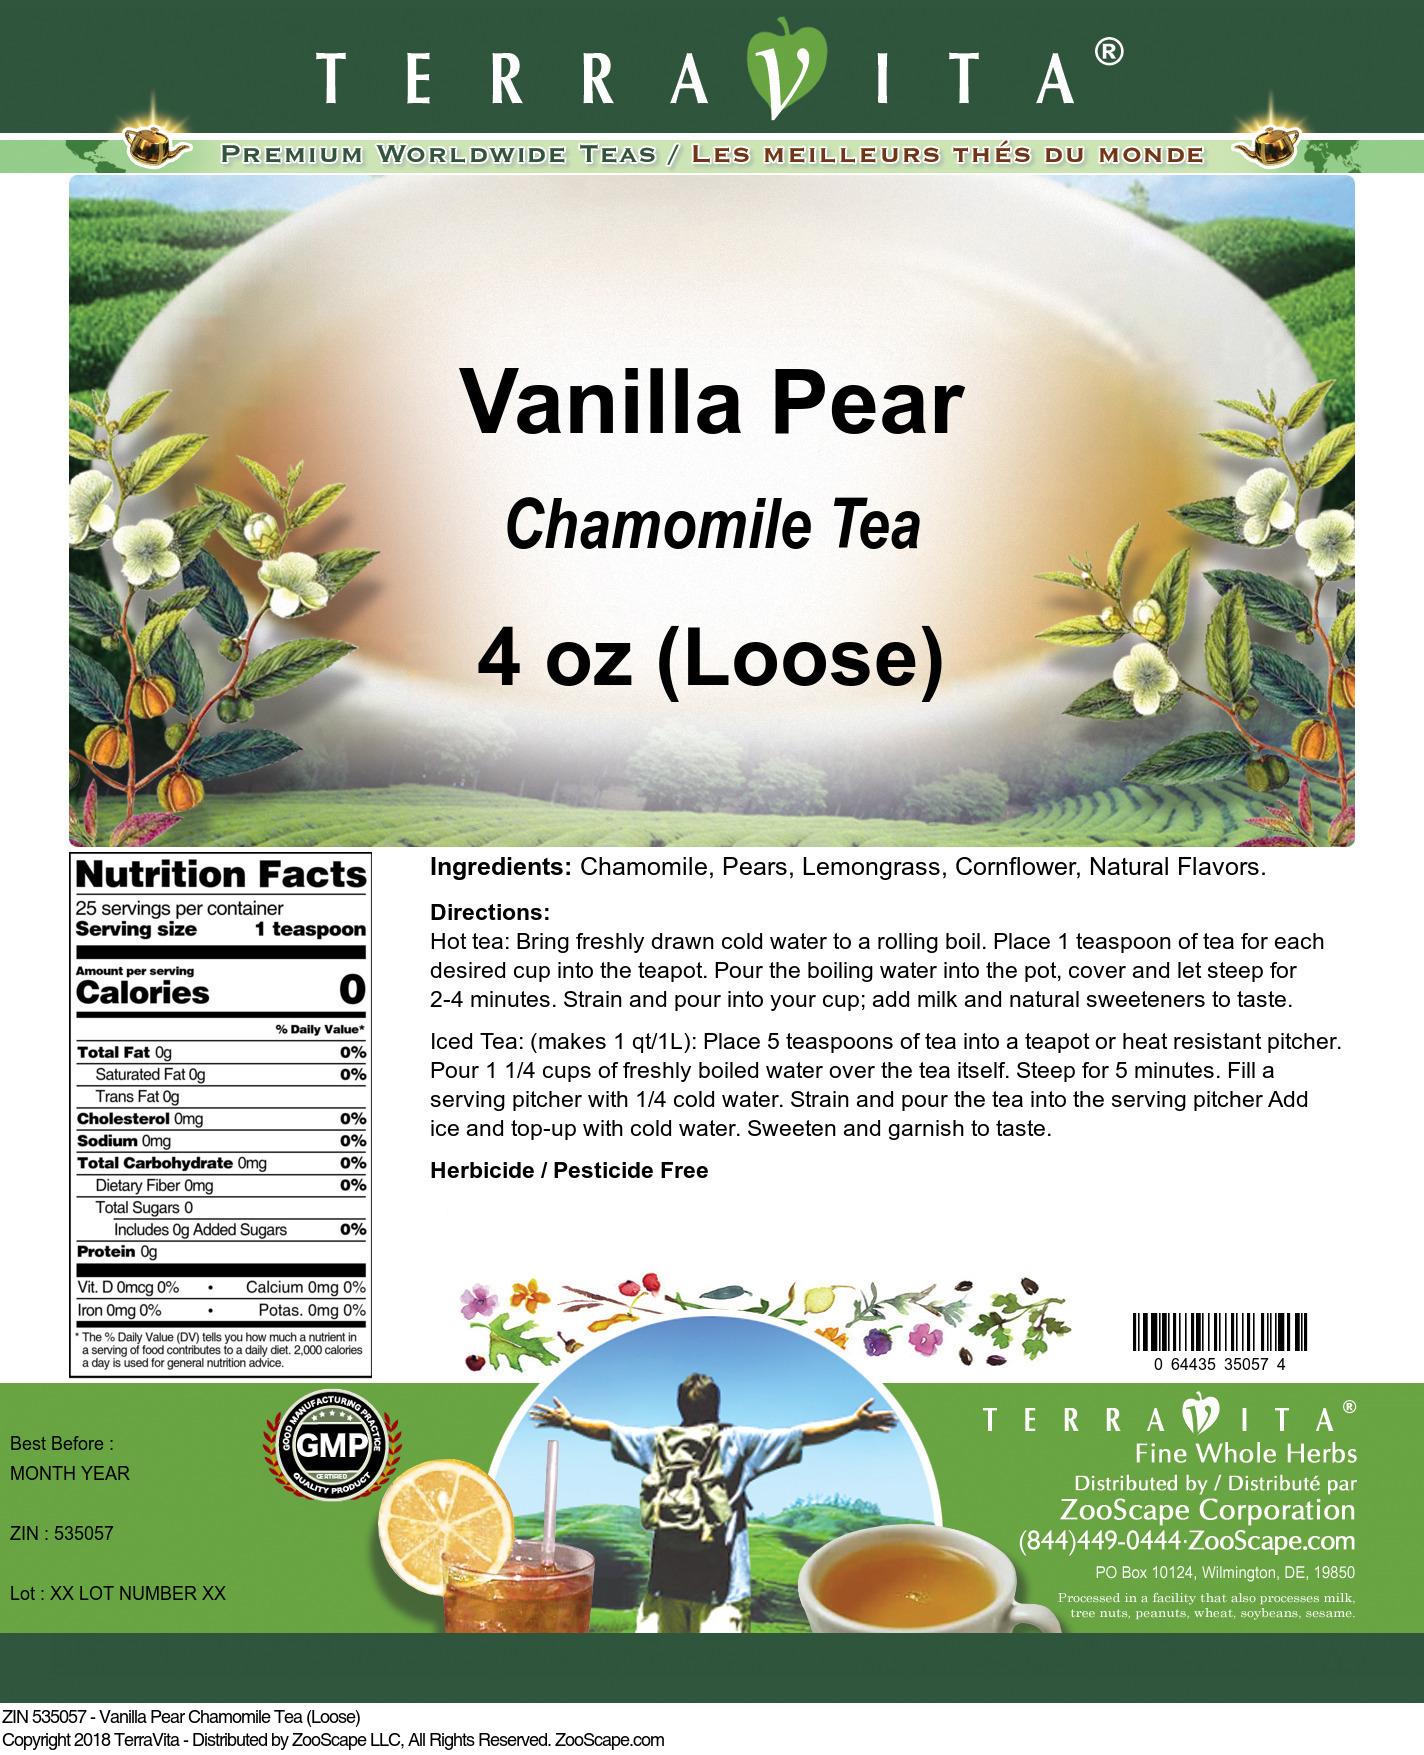 Vanilla Pear Chamomile Tea